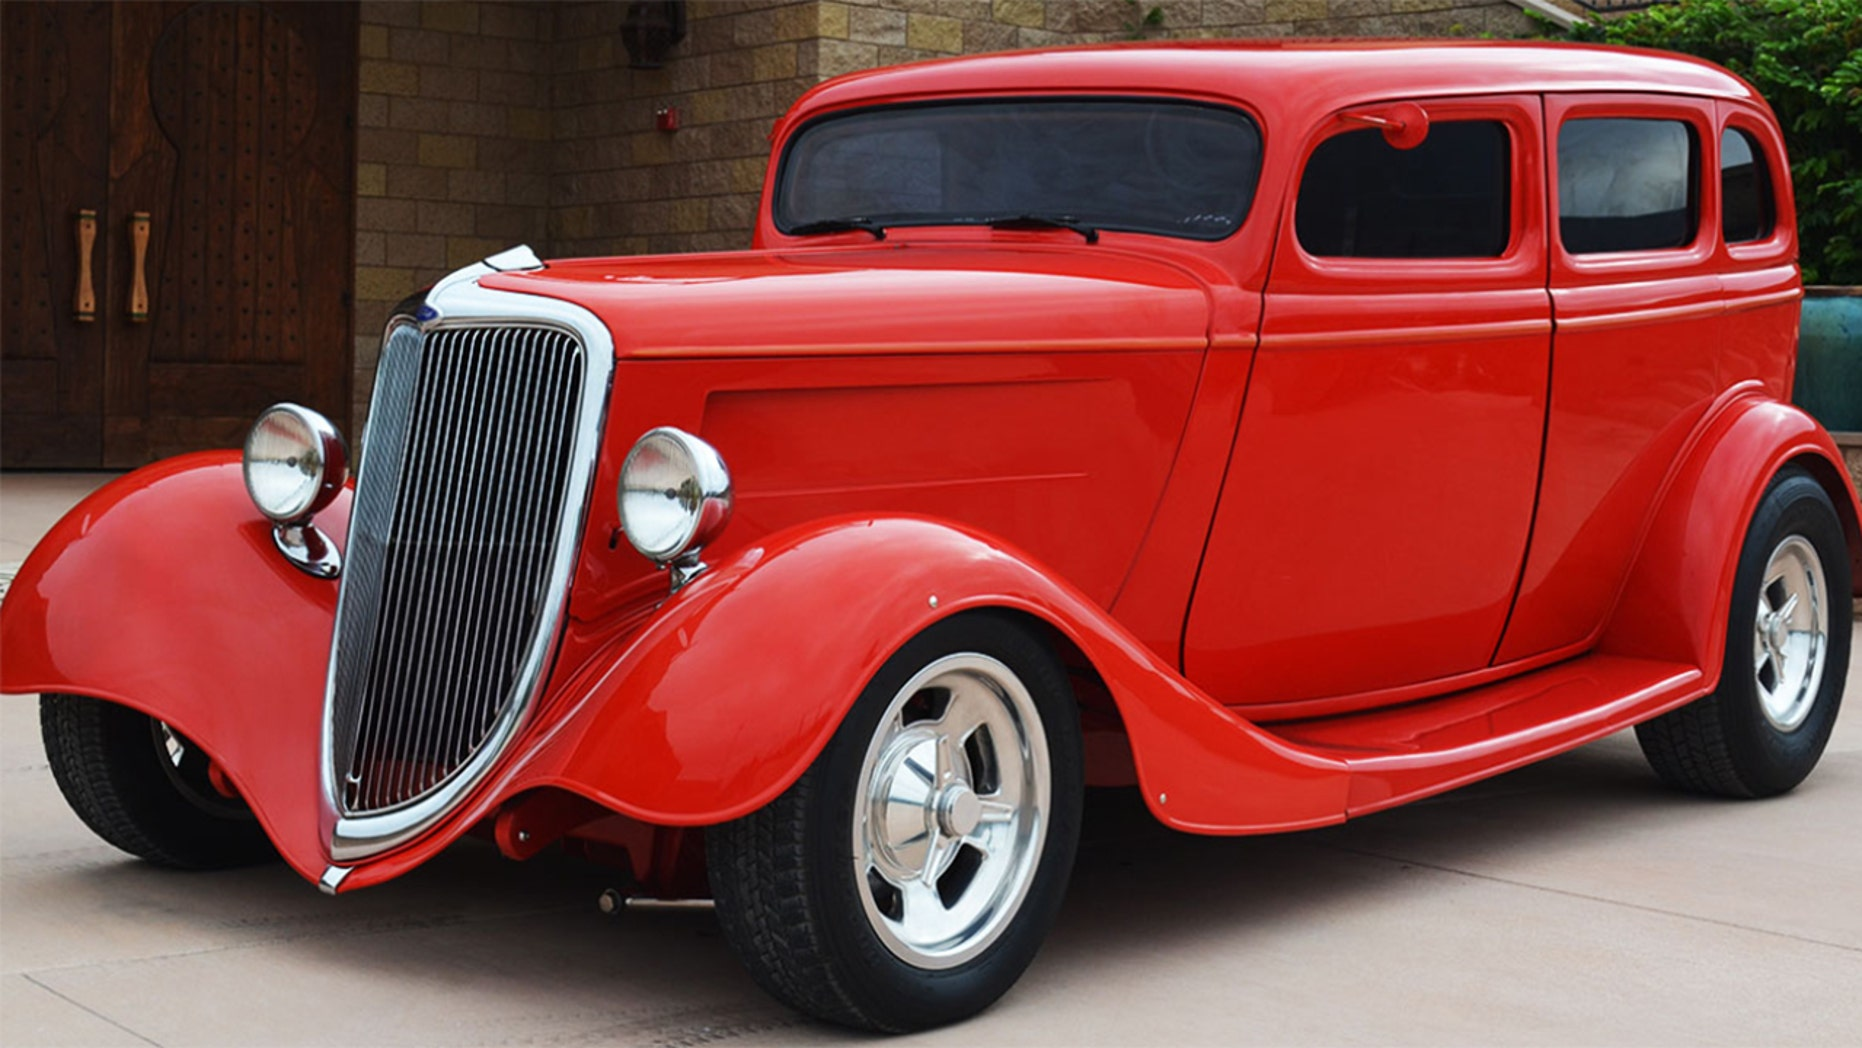 Eddie Van Halen's 1934 Ford